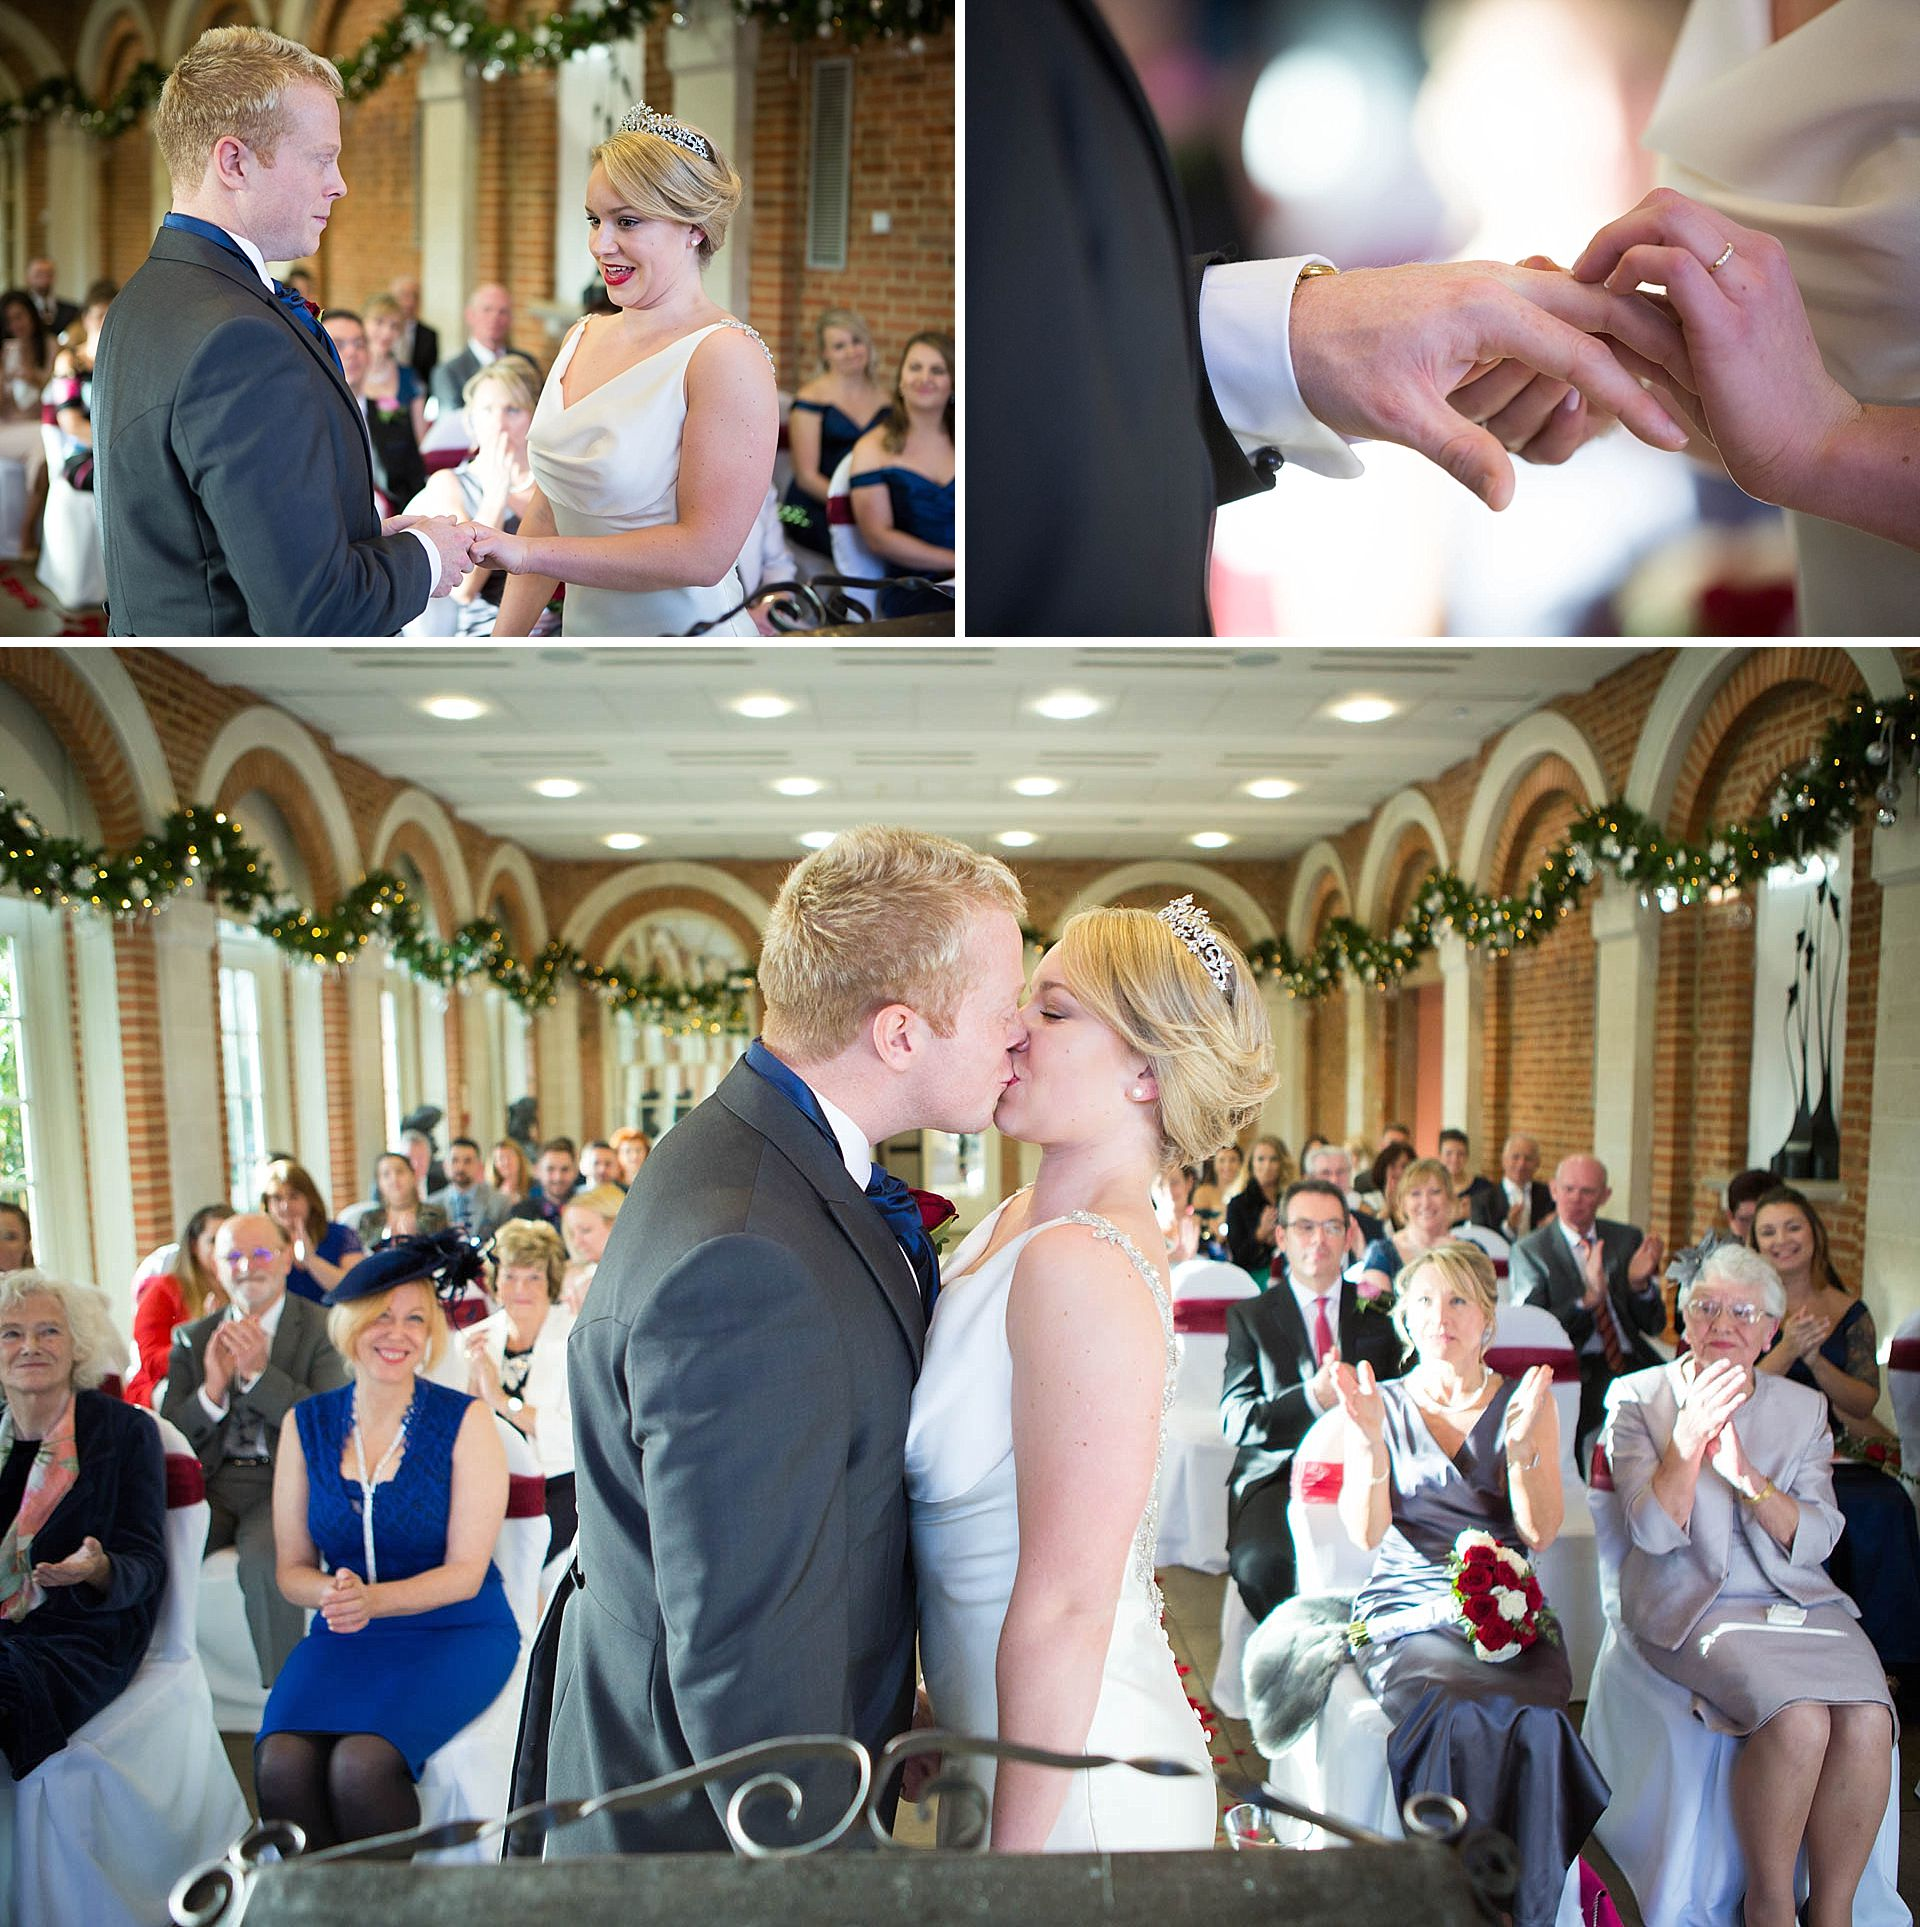 Repotage Wedding Photography